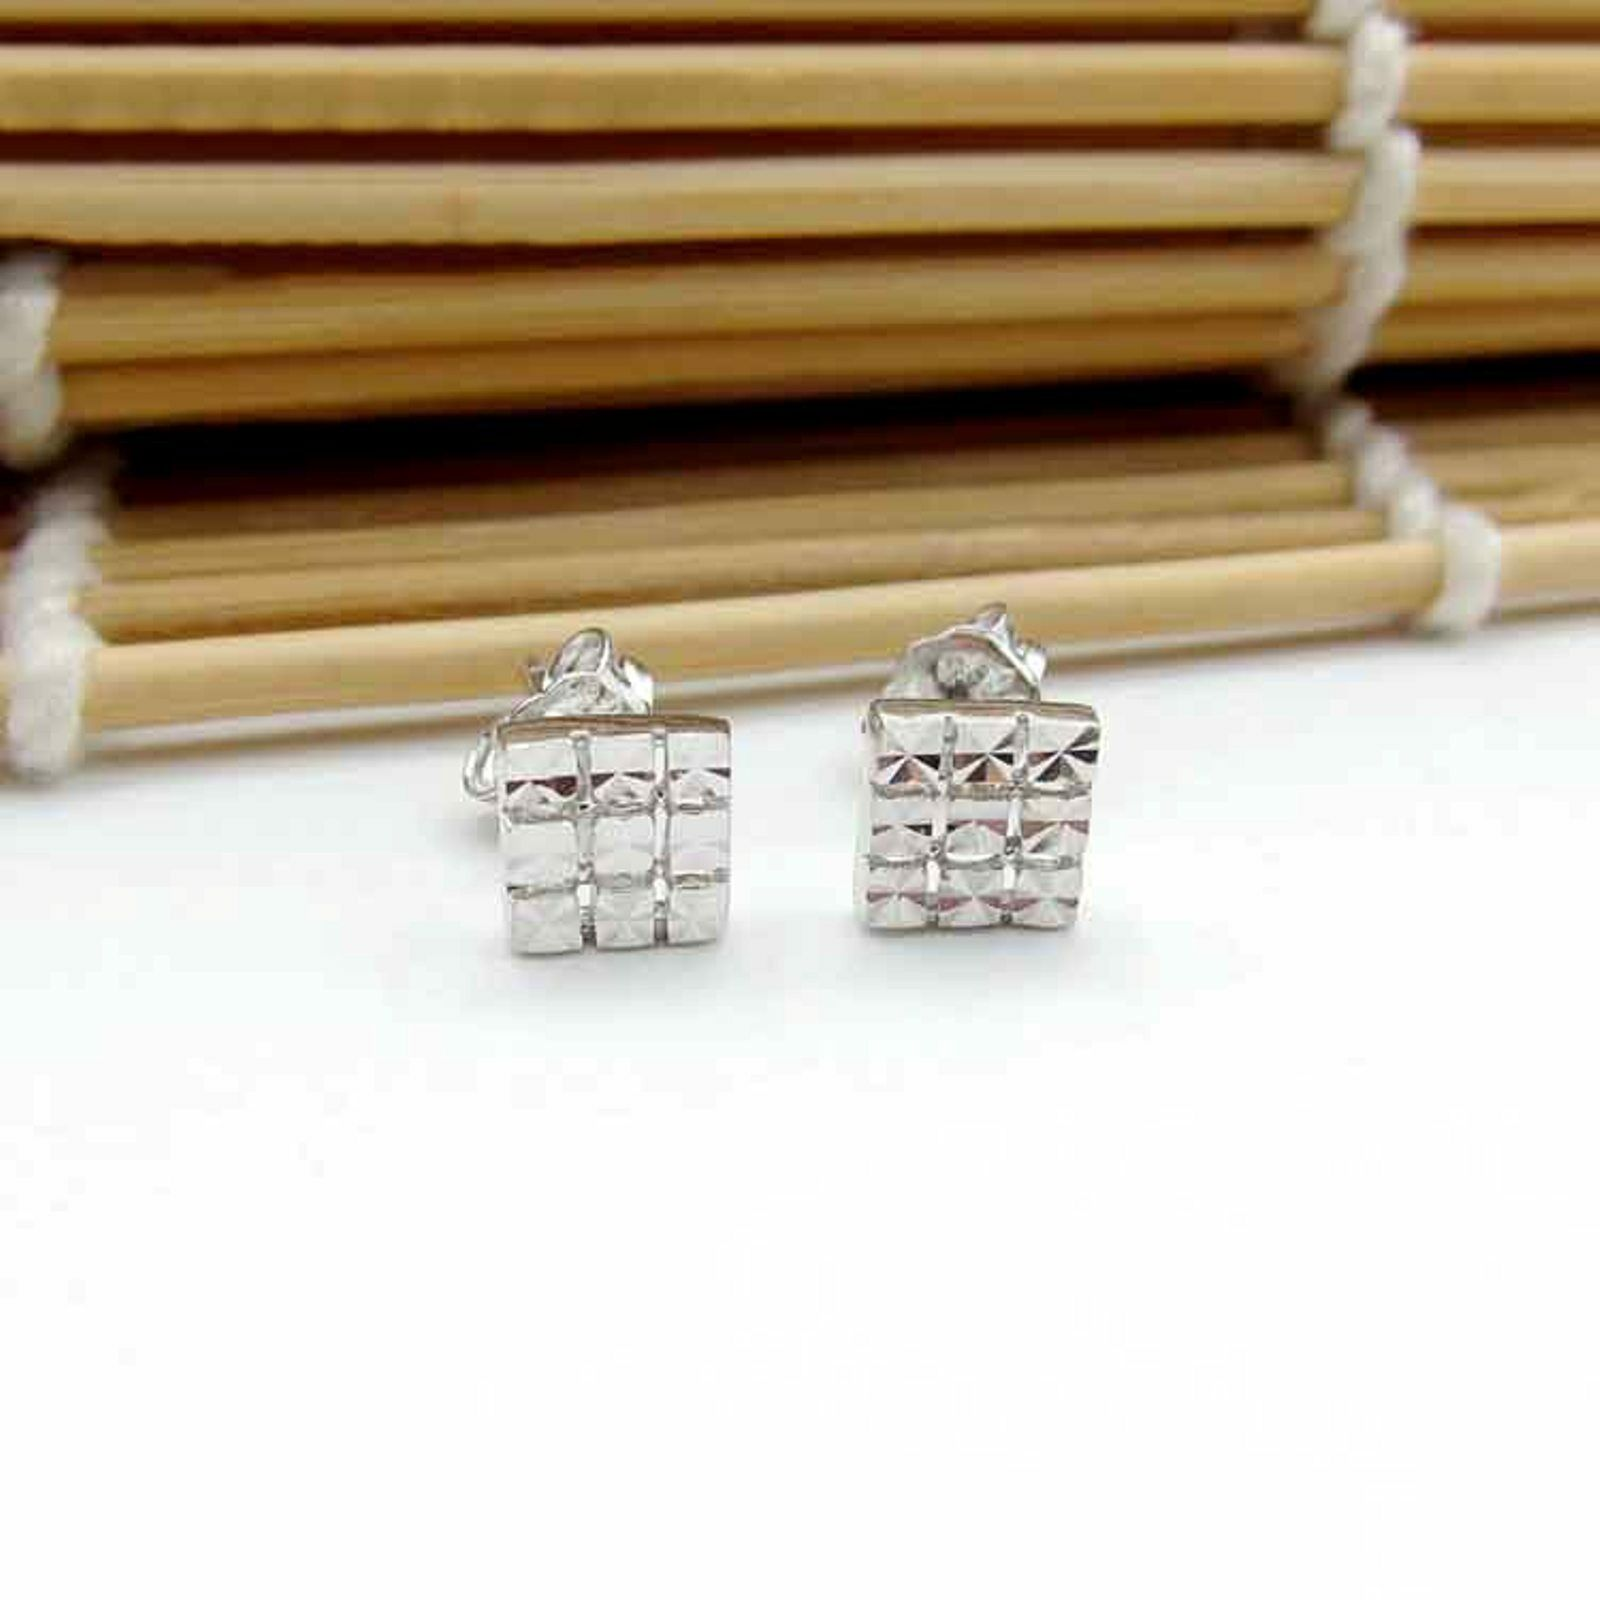 PT950 Pure Platinum 950 Earrings   Women Craved Square  Stud Earrings  2.21g